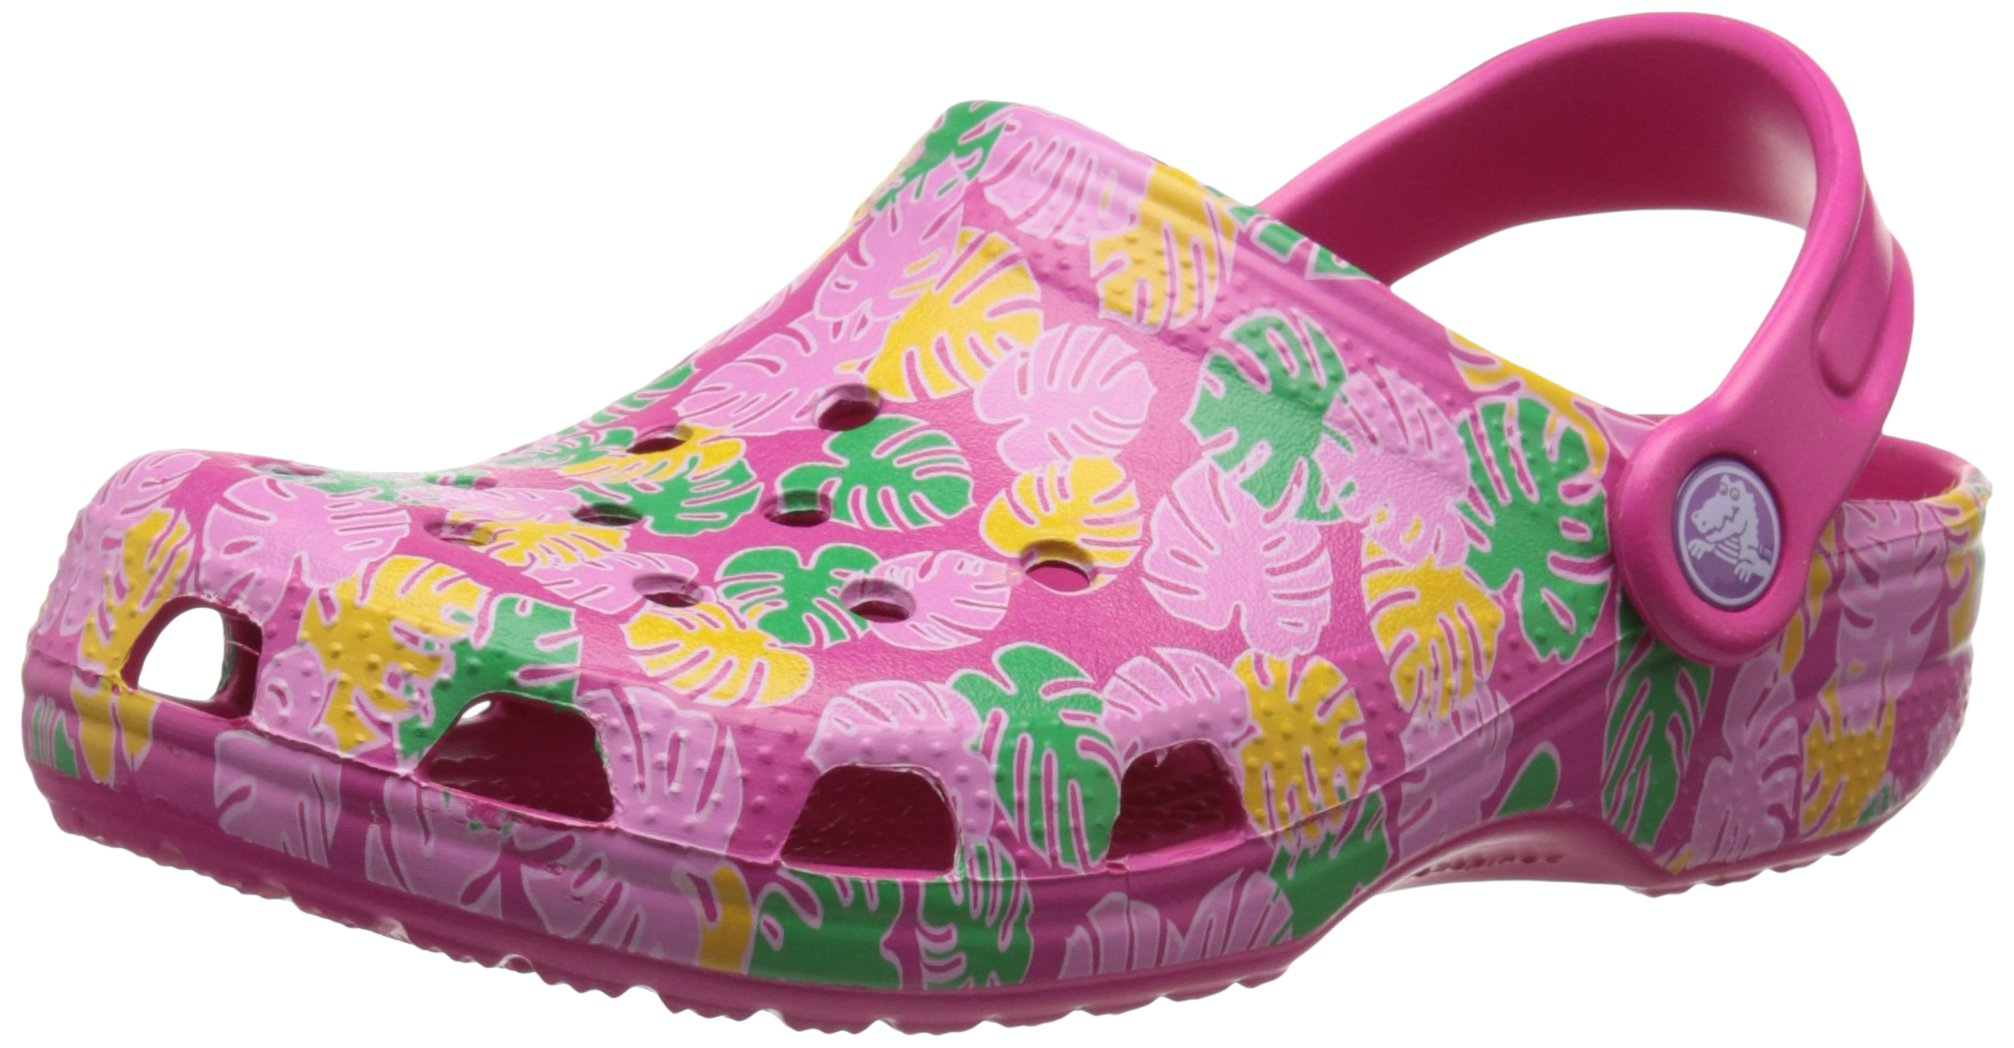 crocs Classic Tropical K Clog (Toddler/Little Kid/Big Kid), Candy Pink, 3 M US Little Kid by Crocs